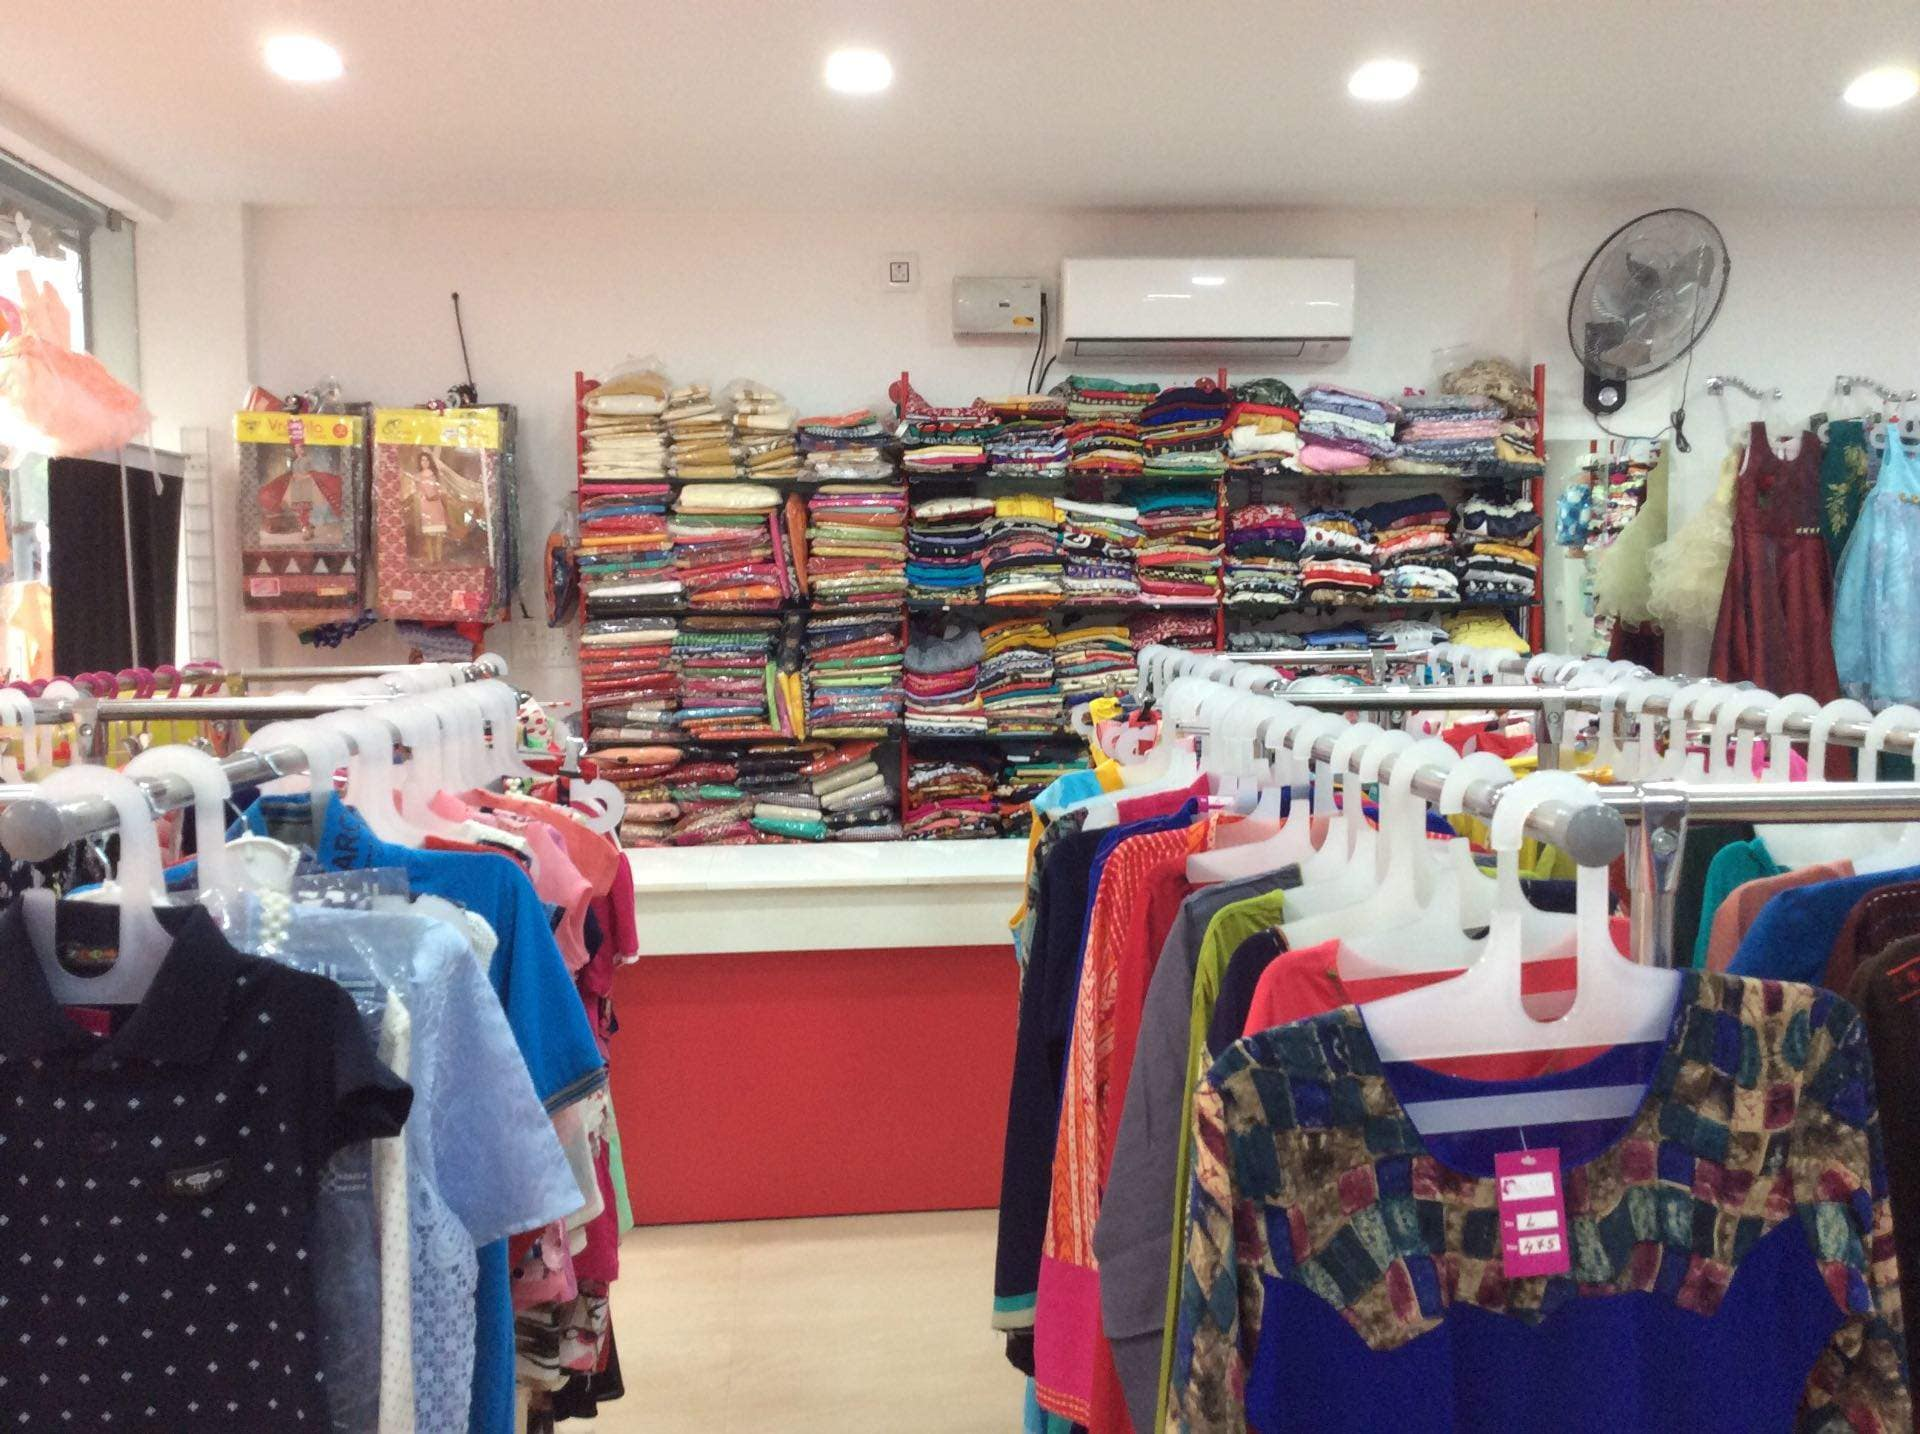 fc7cff2e8a5 Top 100 Ladies Readymade Garment Retailers in Market Road - Best Women  Readymade Garment Retailers Ernakulam - Justdial